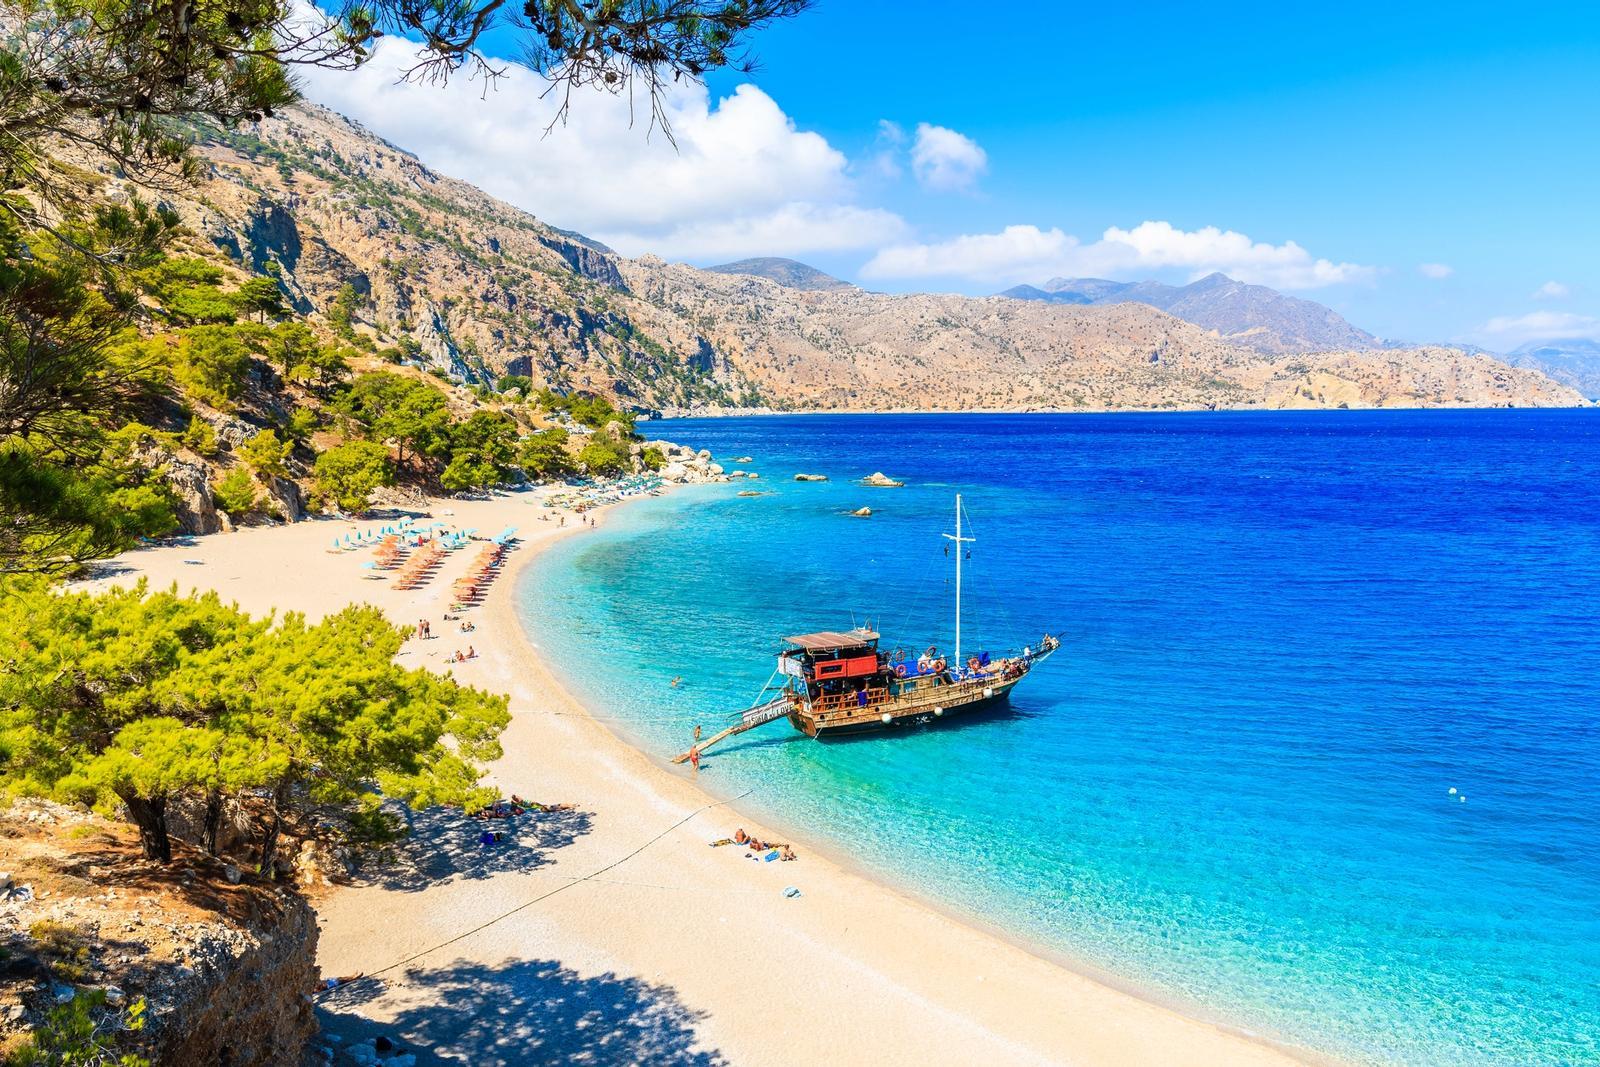 spiaggia di apella a karpathos in grecia